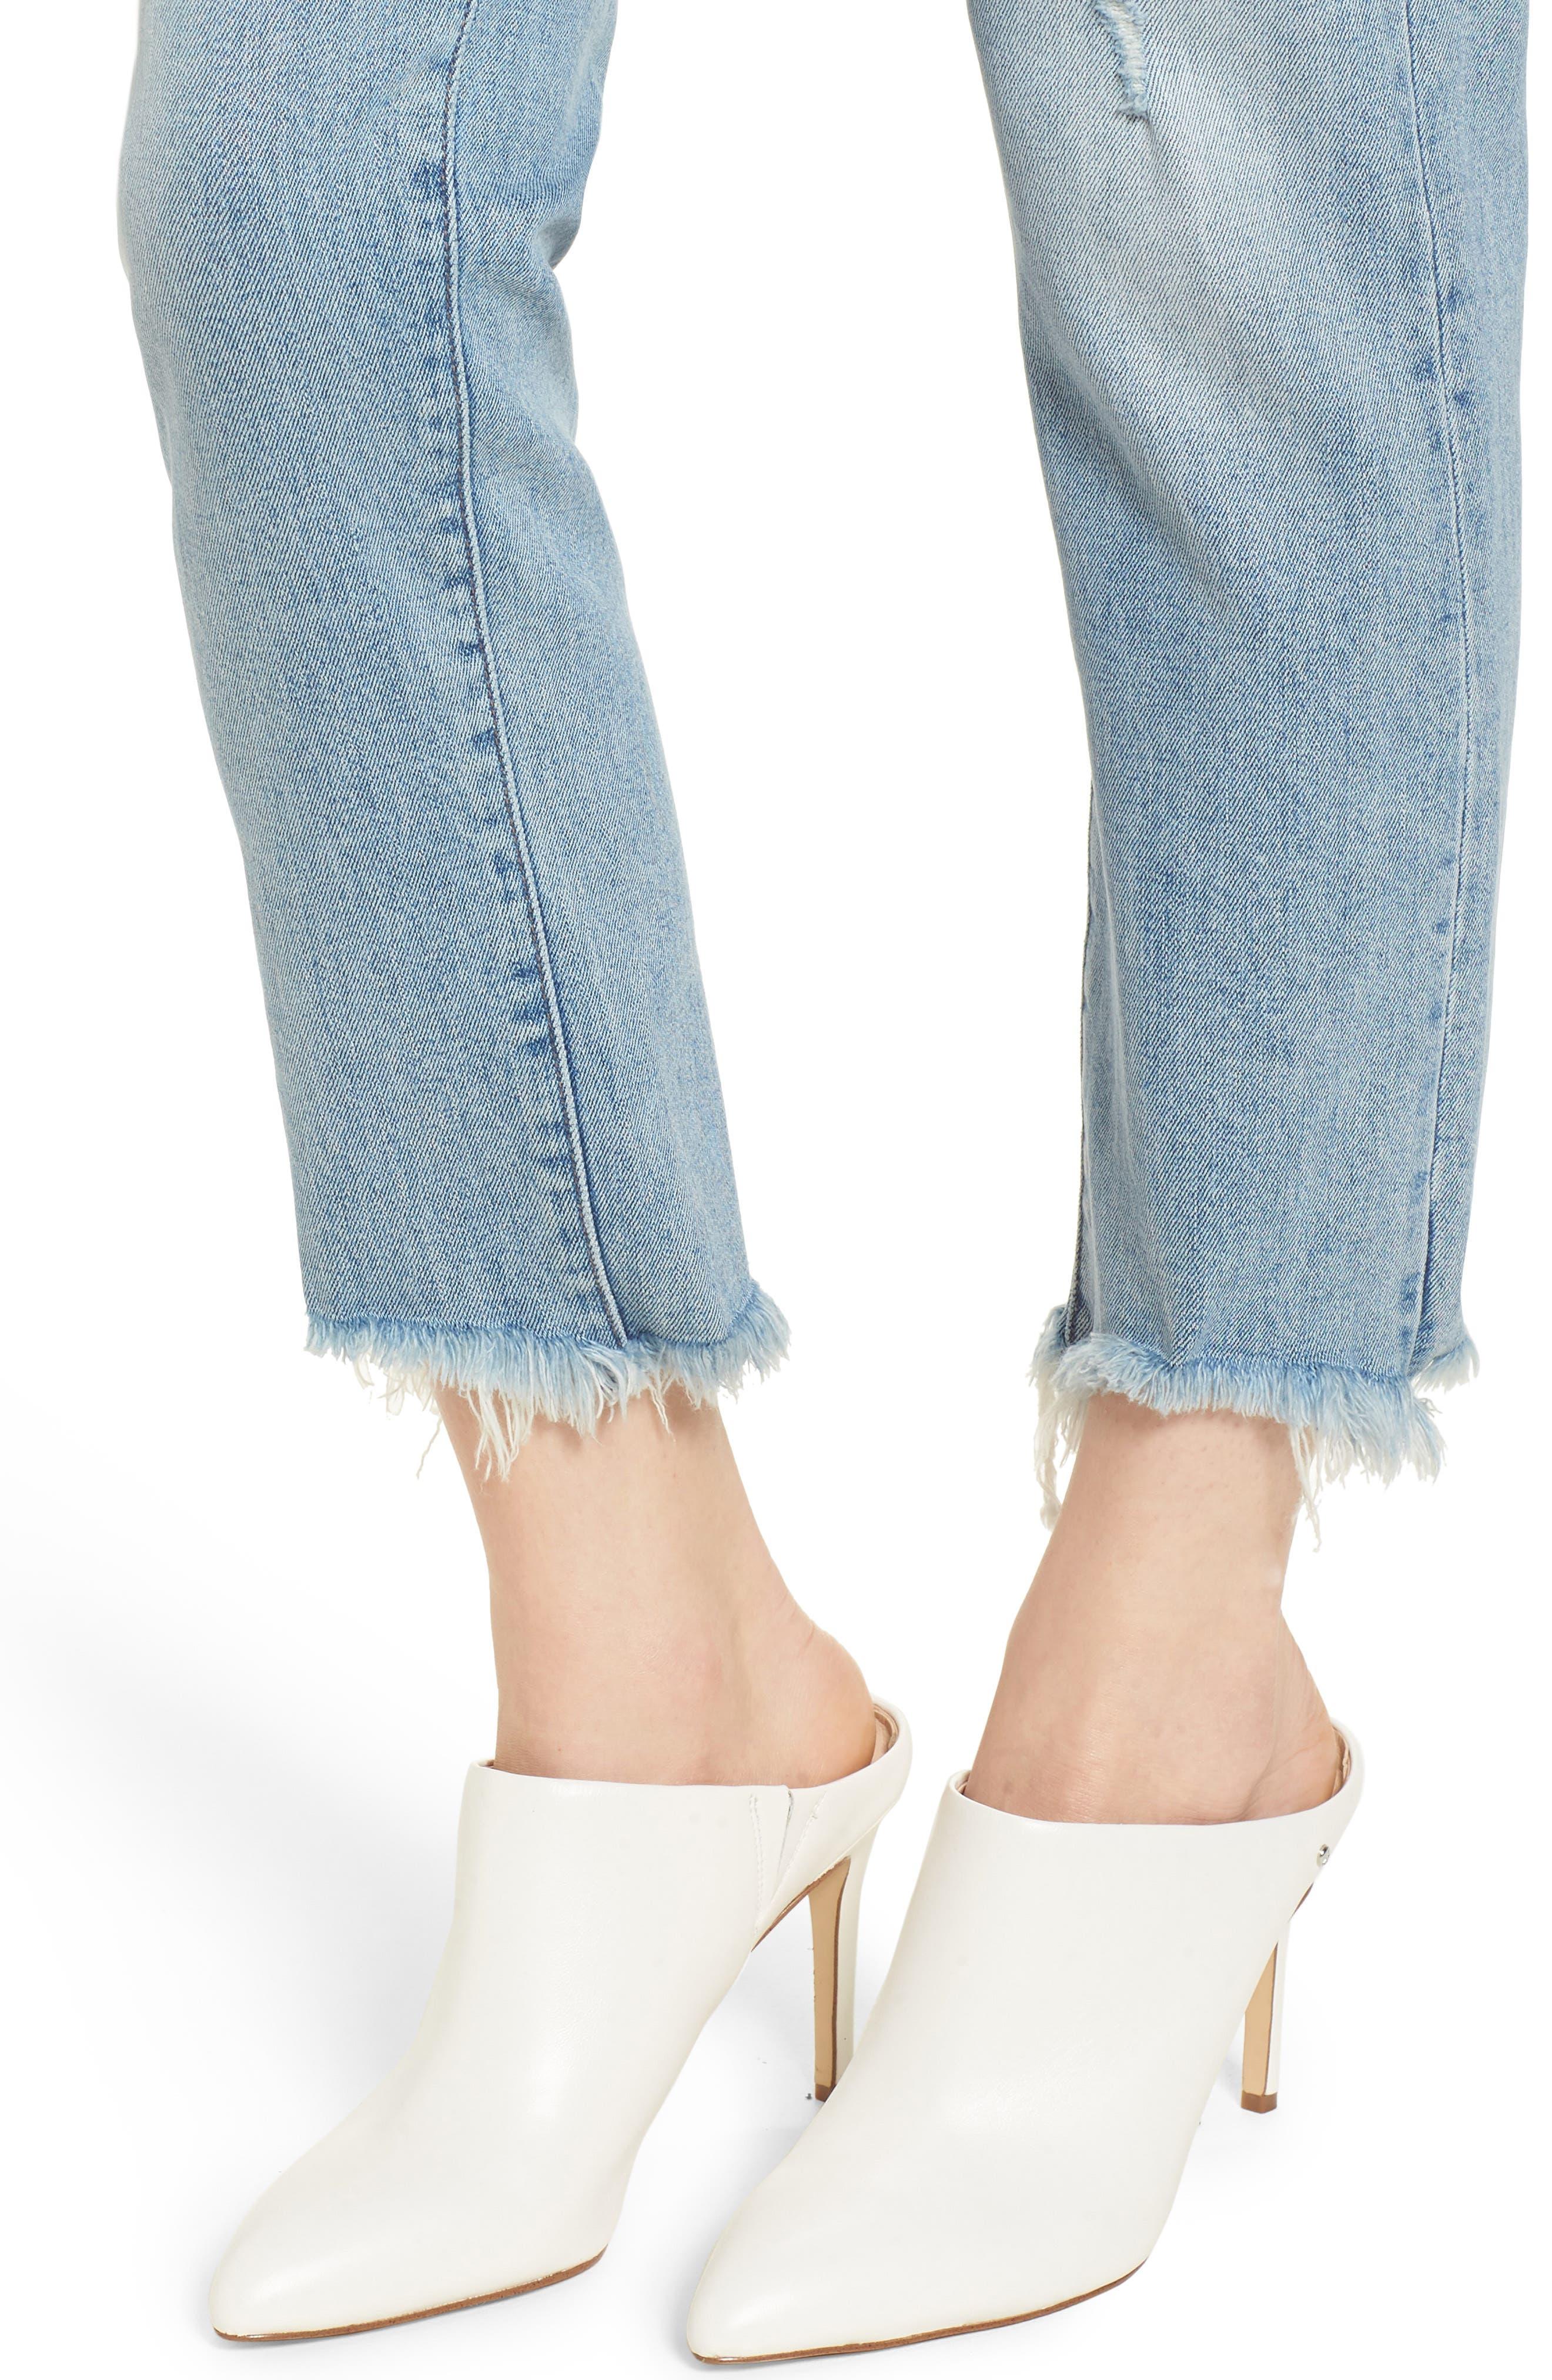 Bella Vintage Crop Slim Jeans,                             Alternate thumbnail 4, color,                             430